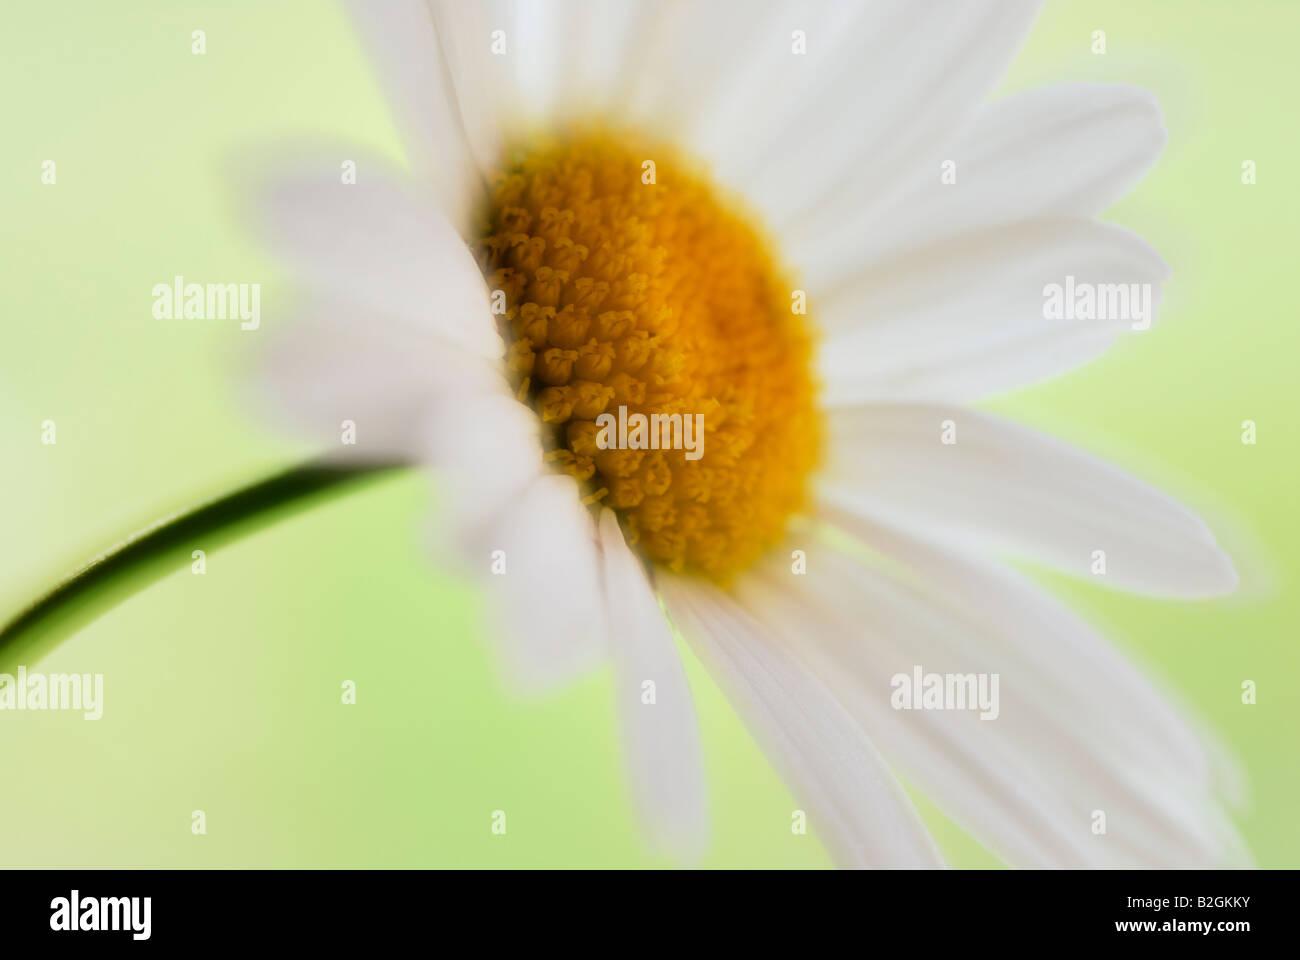 oxeye daisy Leucanthemum vulgare flowering plant bloom blossom blooming still stills background backgrounds patterns patterns c Stock Photo